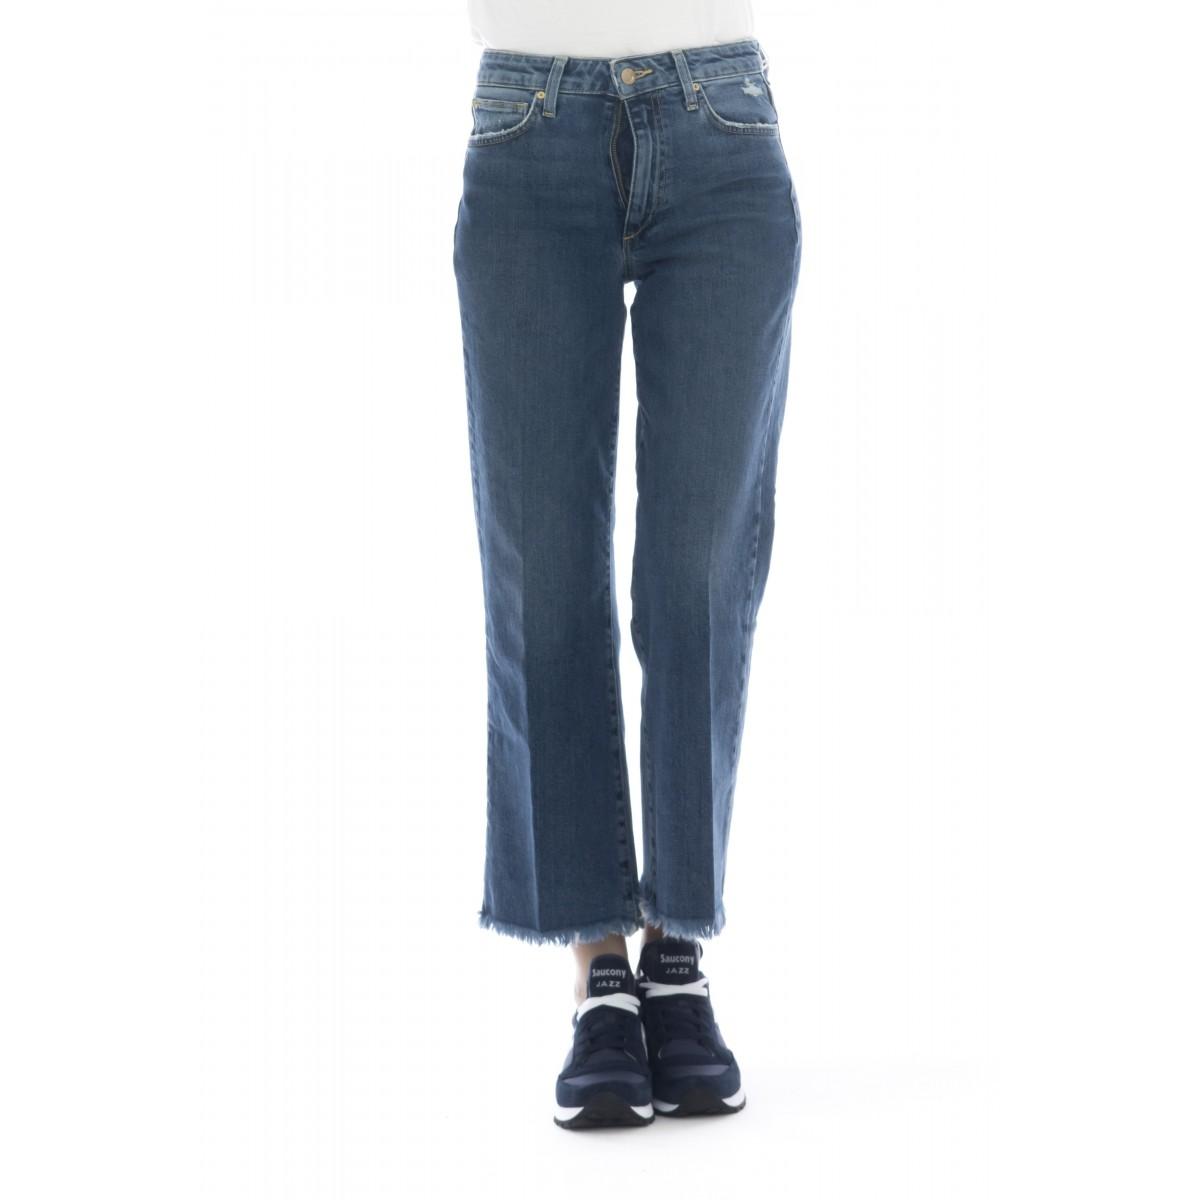 Jeans - 5815 wyatt